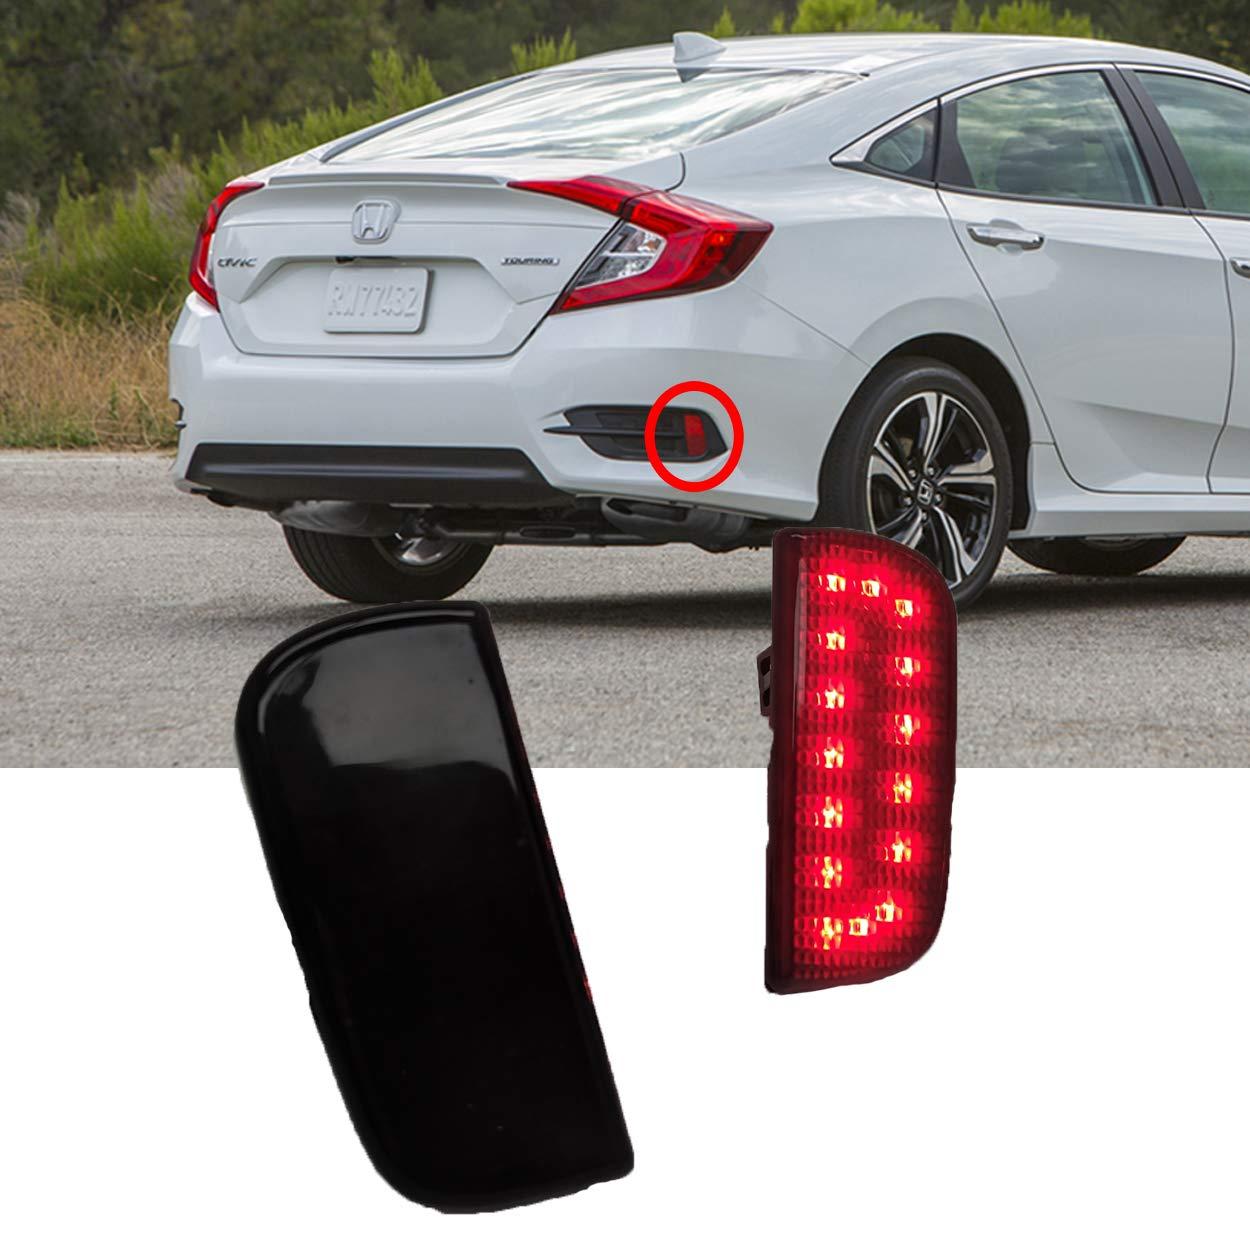 TopPick LED Bumper Reflector Lights FOR Honda Civic X 2016-2019 Smoke//Black 33555TBAA01-S-33505TBAA01-S